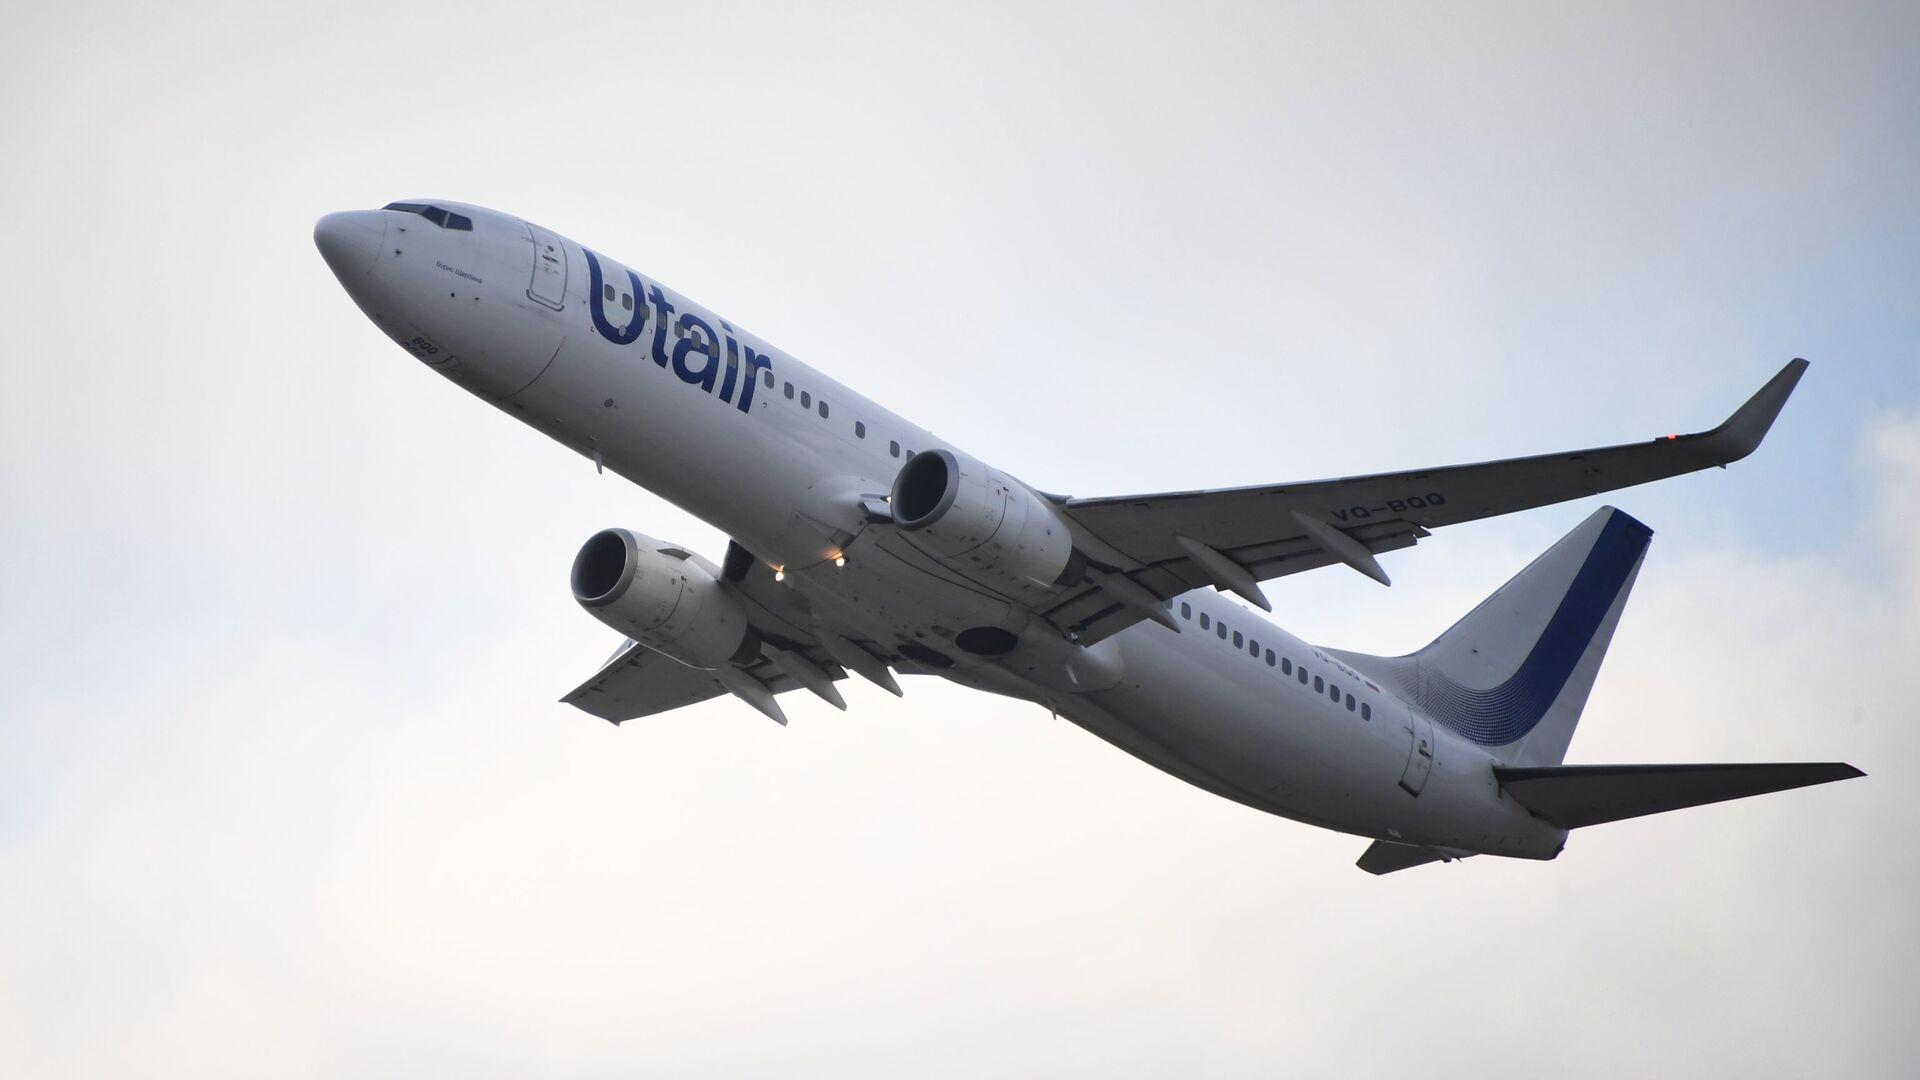 Самолет Boeing 737-800 авиакомпании ЮТэйр - Sputnik Беларусь, 1920, 04.10.2021